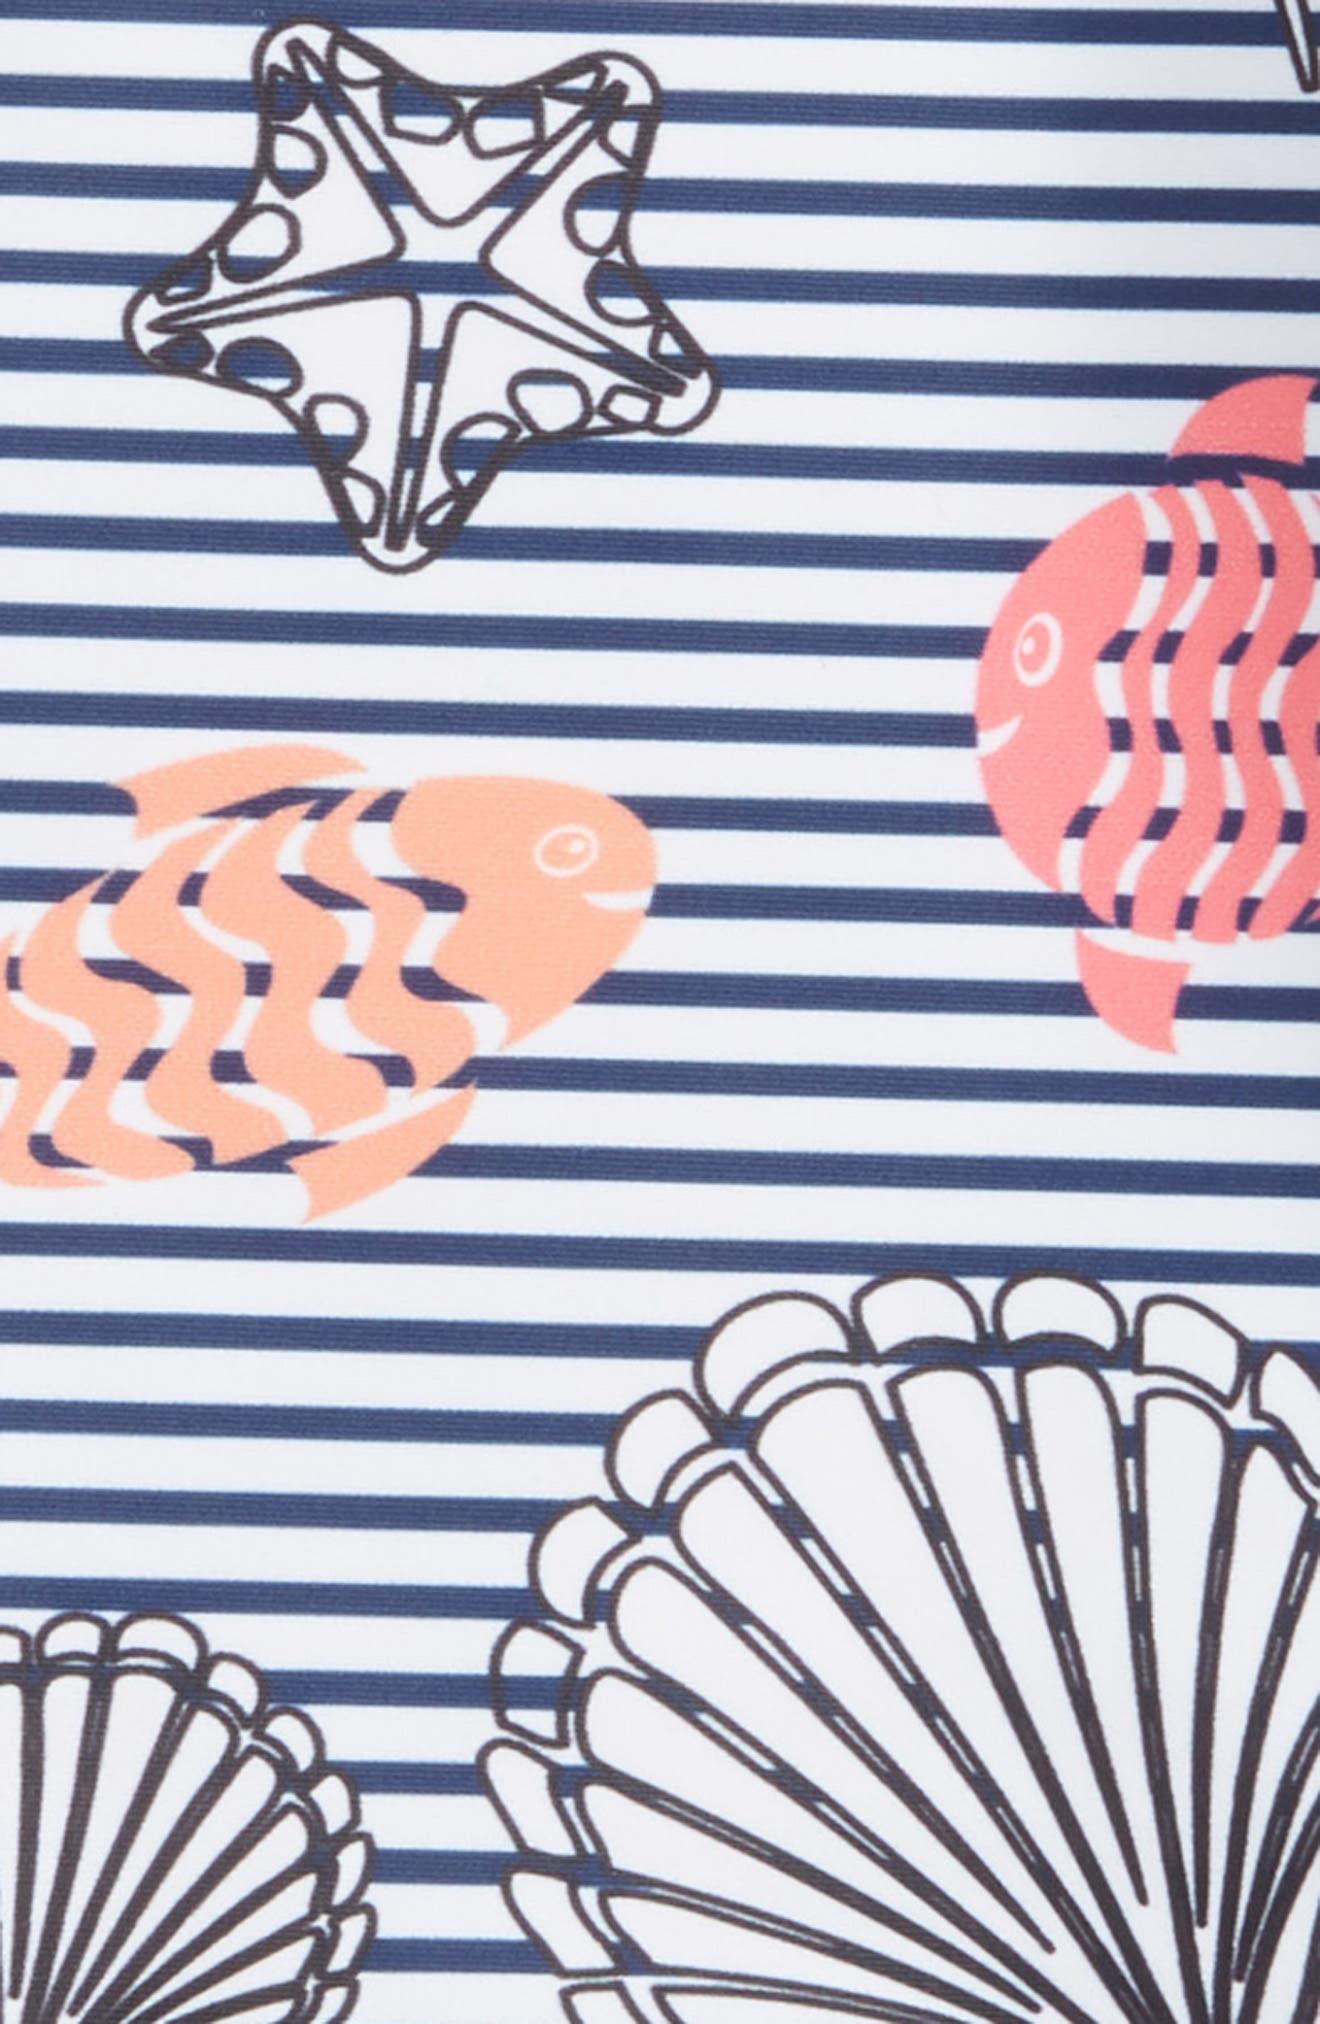 Skirted Two-Piece Rashguard Swimsuit,                             Alternate thumbnail 2, color,                             410